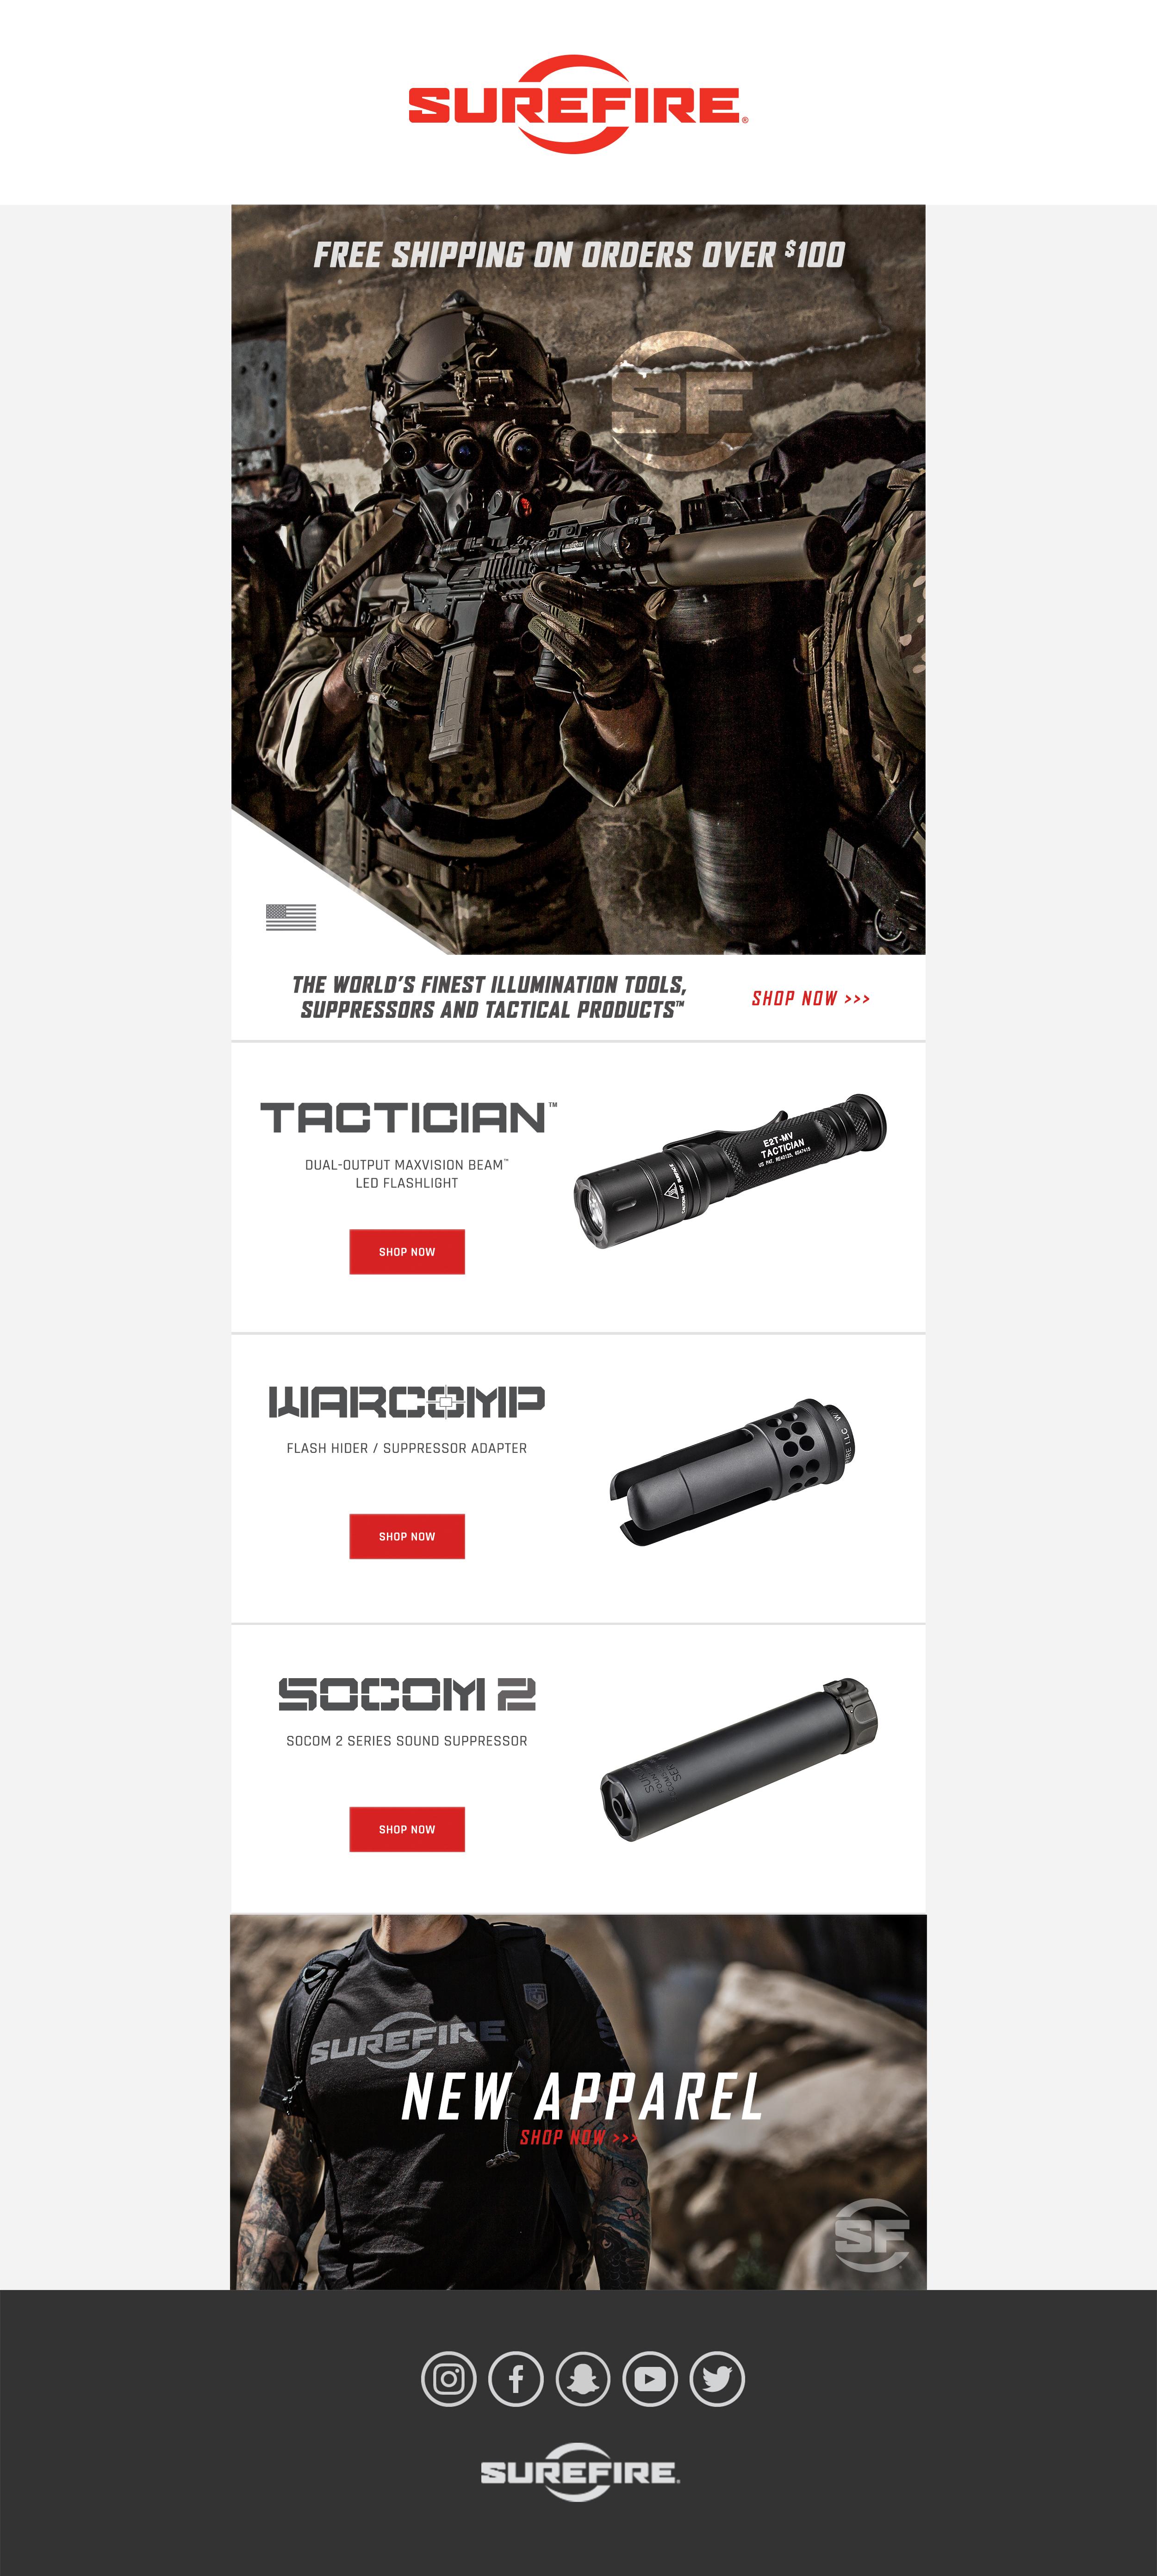 Tactician-Warcom-Socom-e-blast.jpg